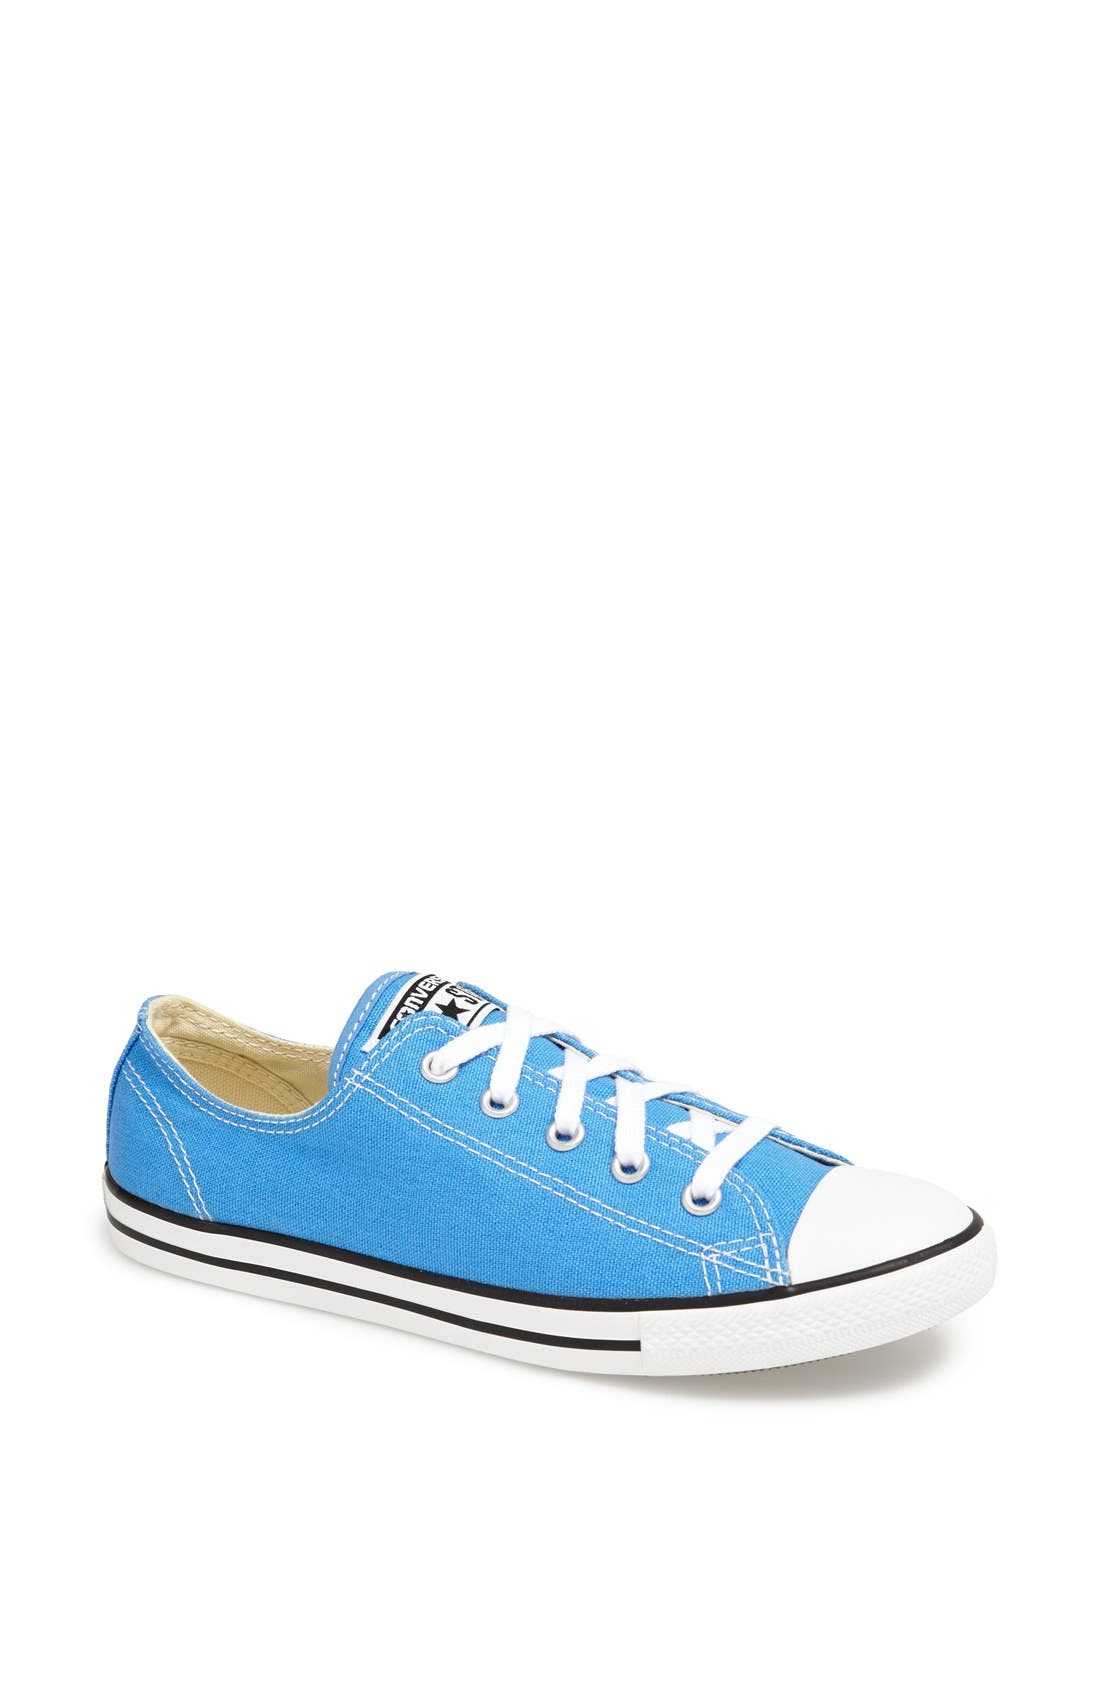 Main Image - Converse Chuck Taylor® All Star® 'Dainty' Sneaker (Women)